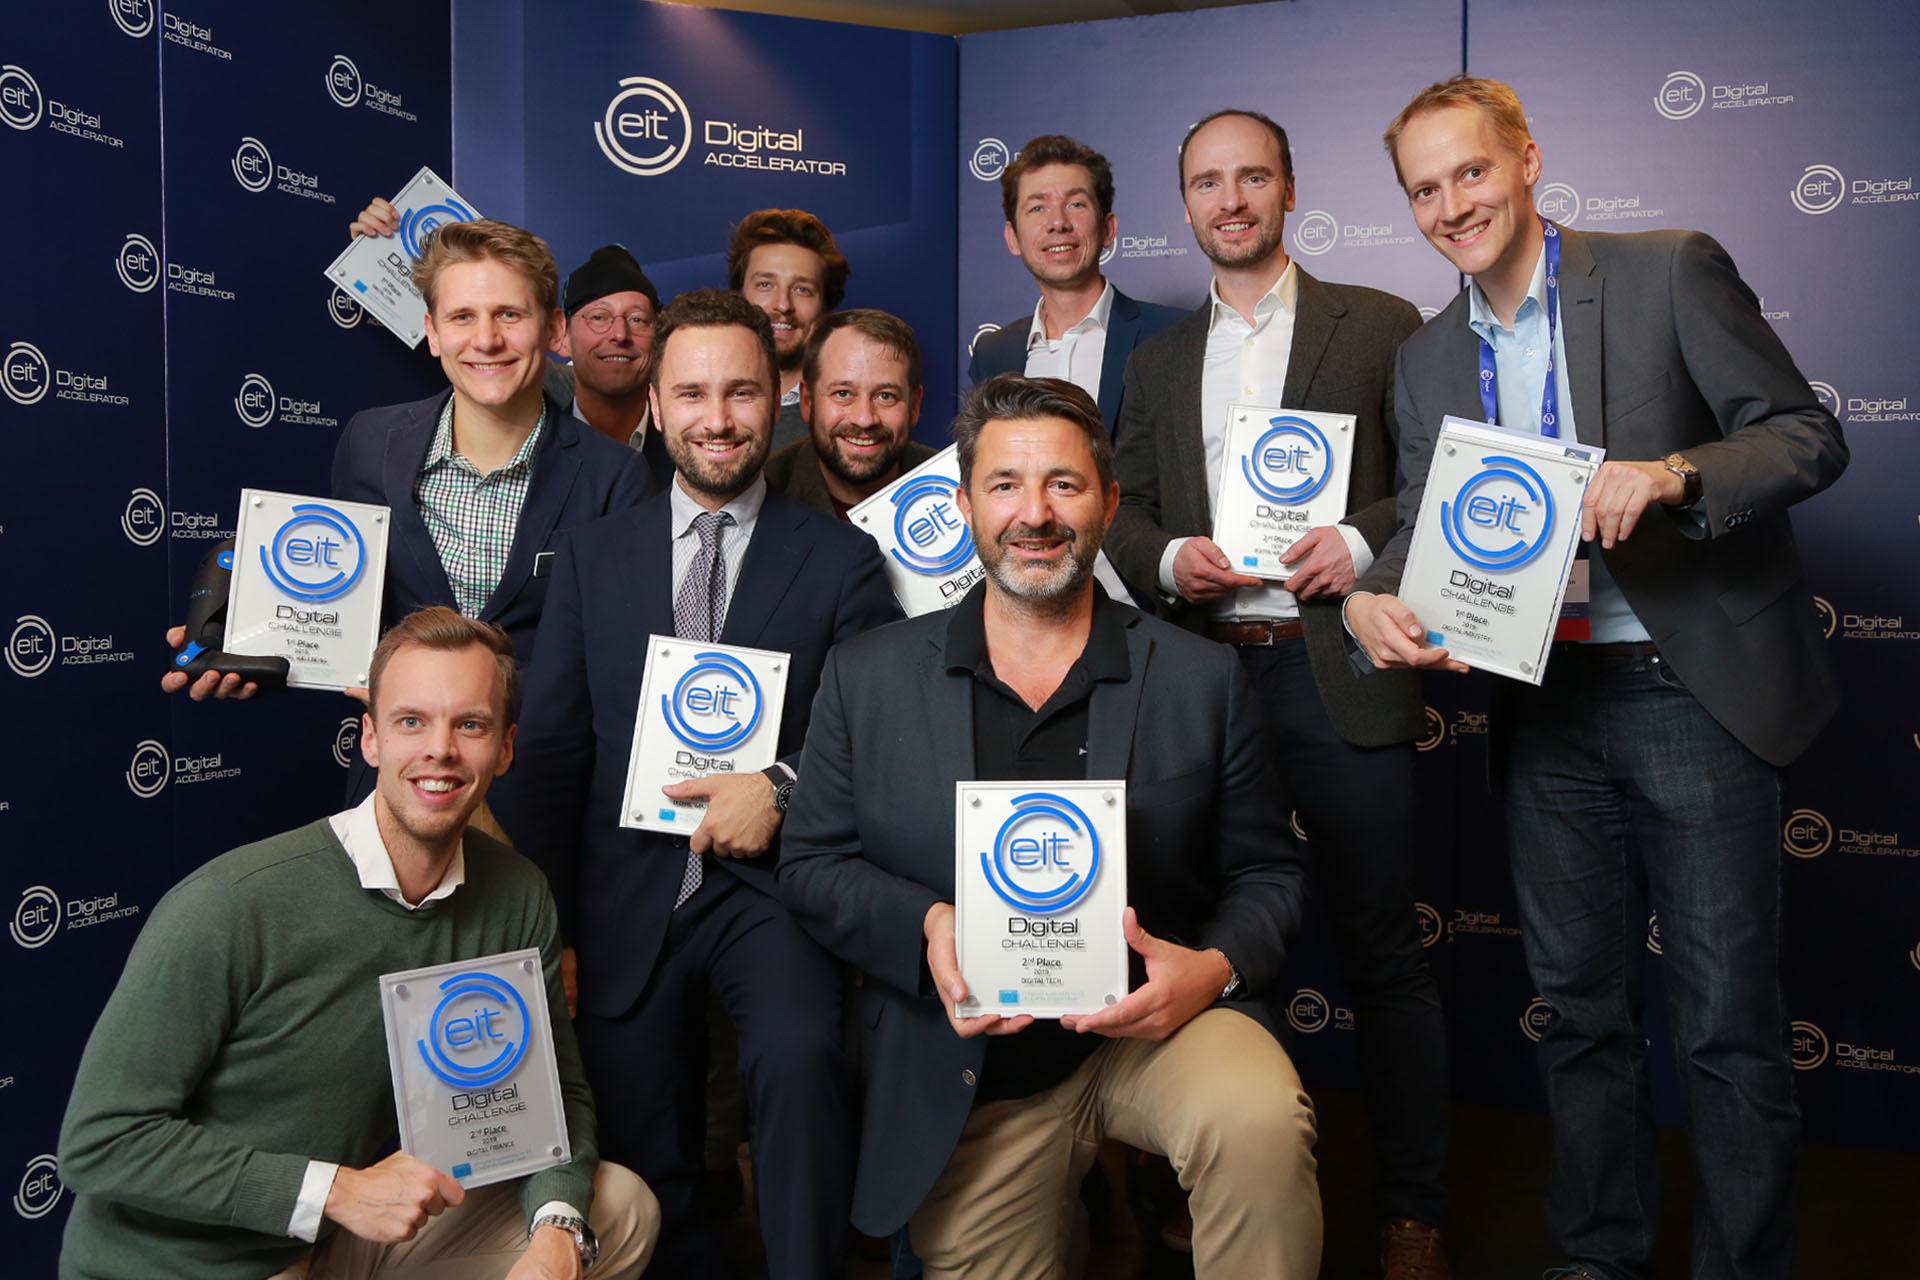 EIT Digital Challenge All Winners